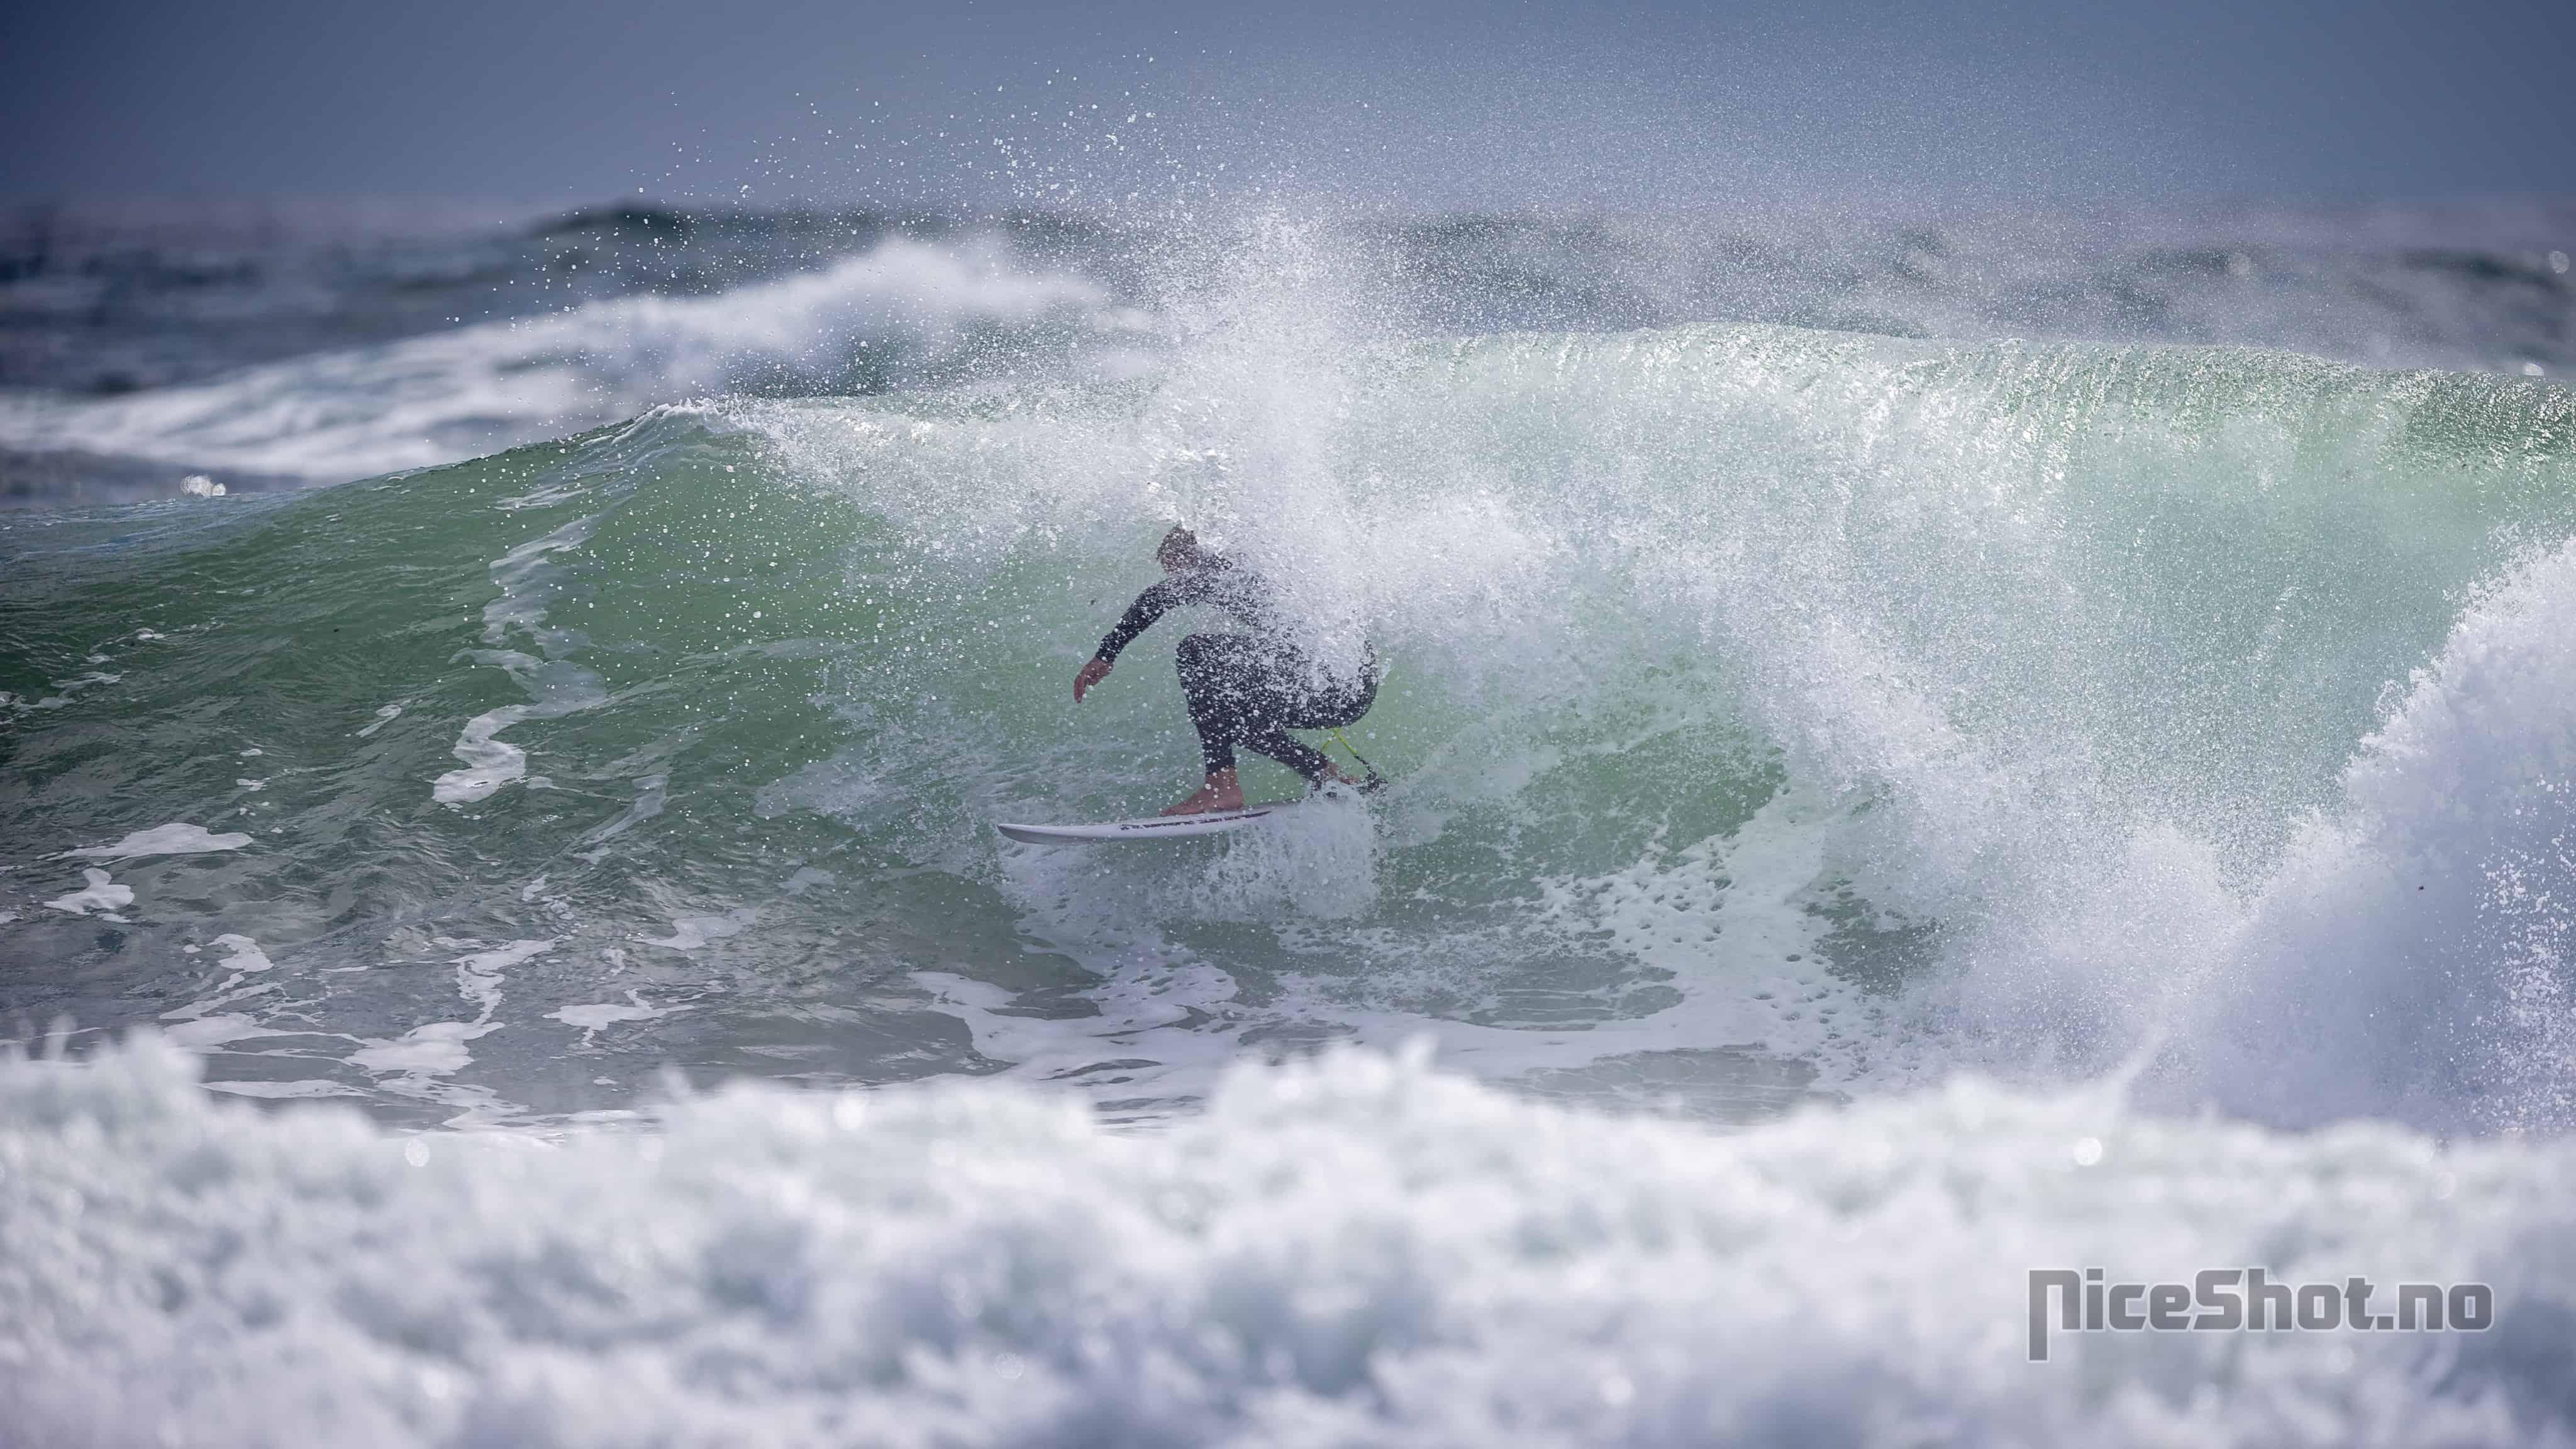 Ukjent surfer coverup. Foto: Tom Ivar Arntsen @NiceShot.no